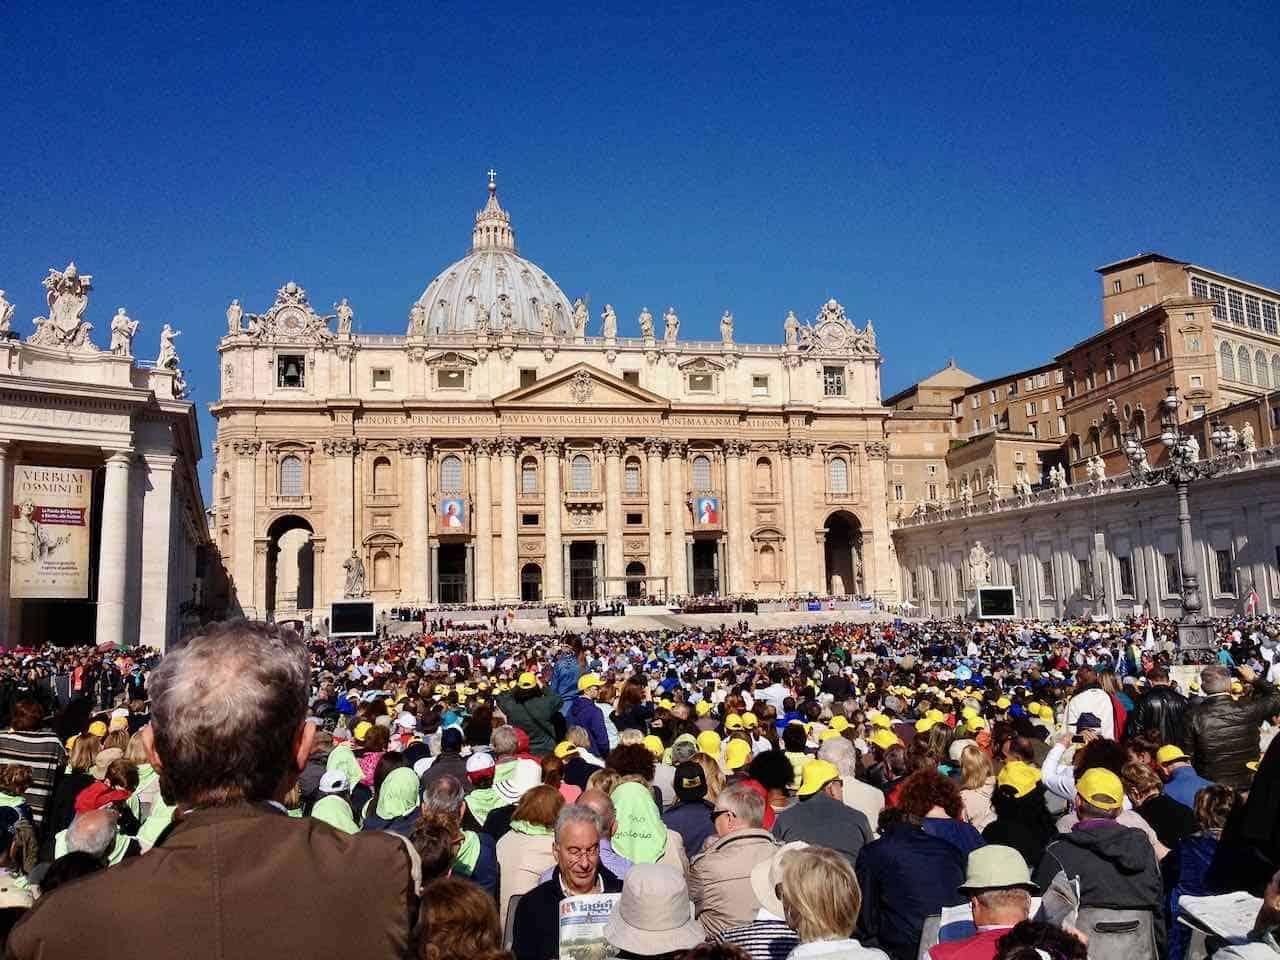 St Peters Square Rome Pilgrimage tour